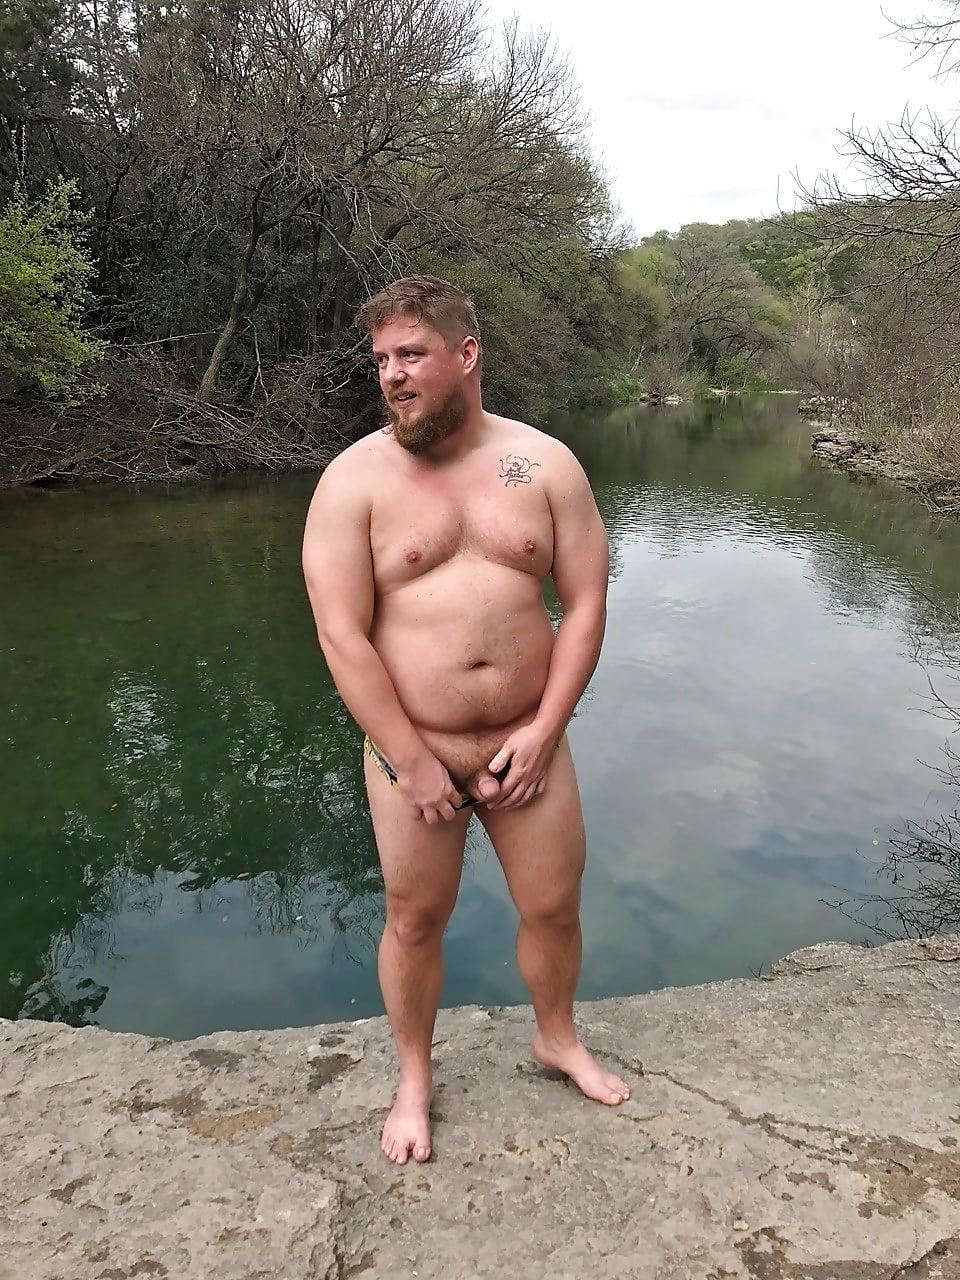 Gay men big daddy hairy chest bear hot guys style muscle boy facial hair mens underwear